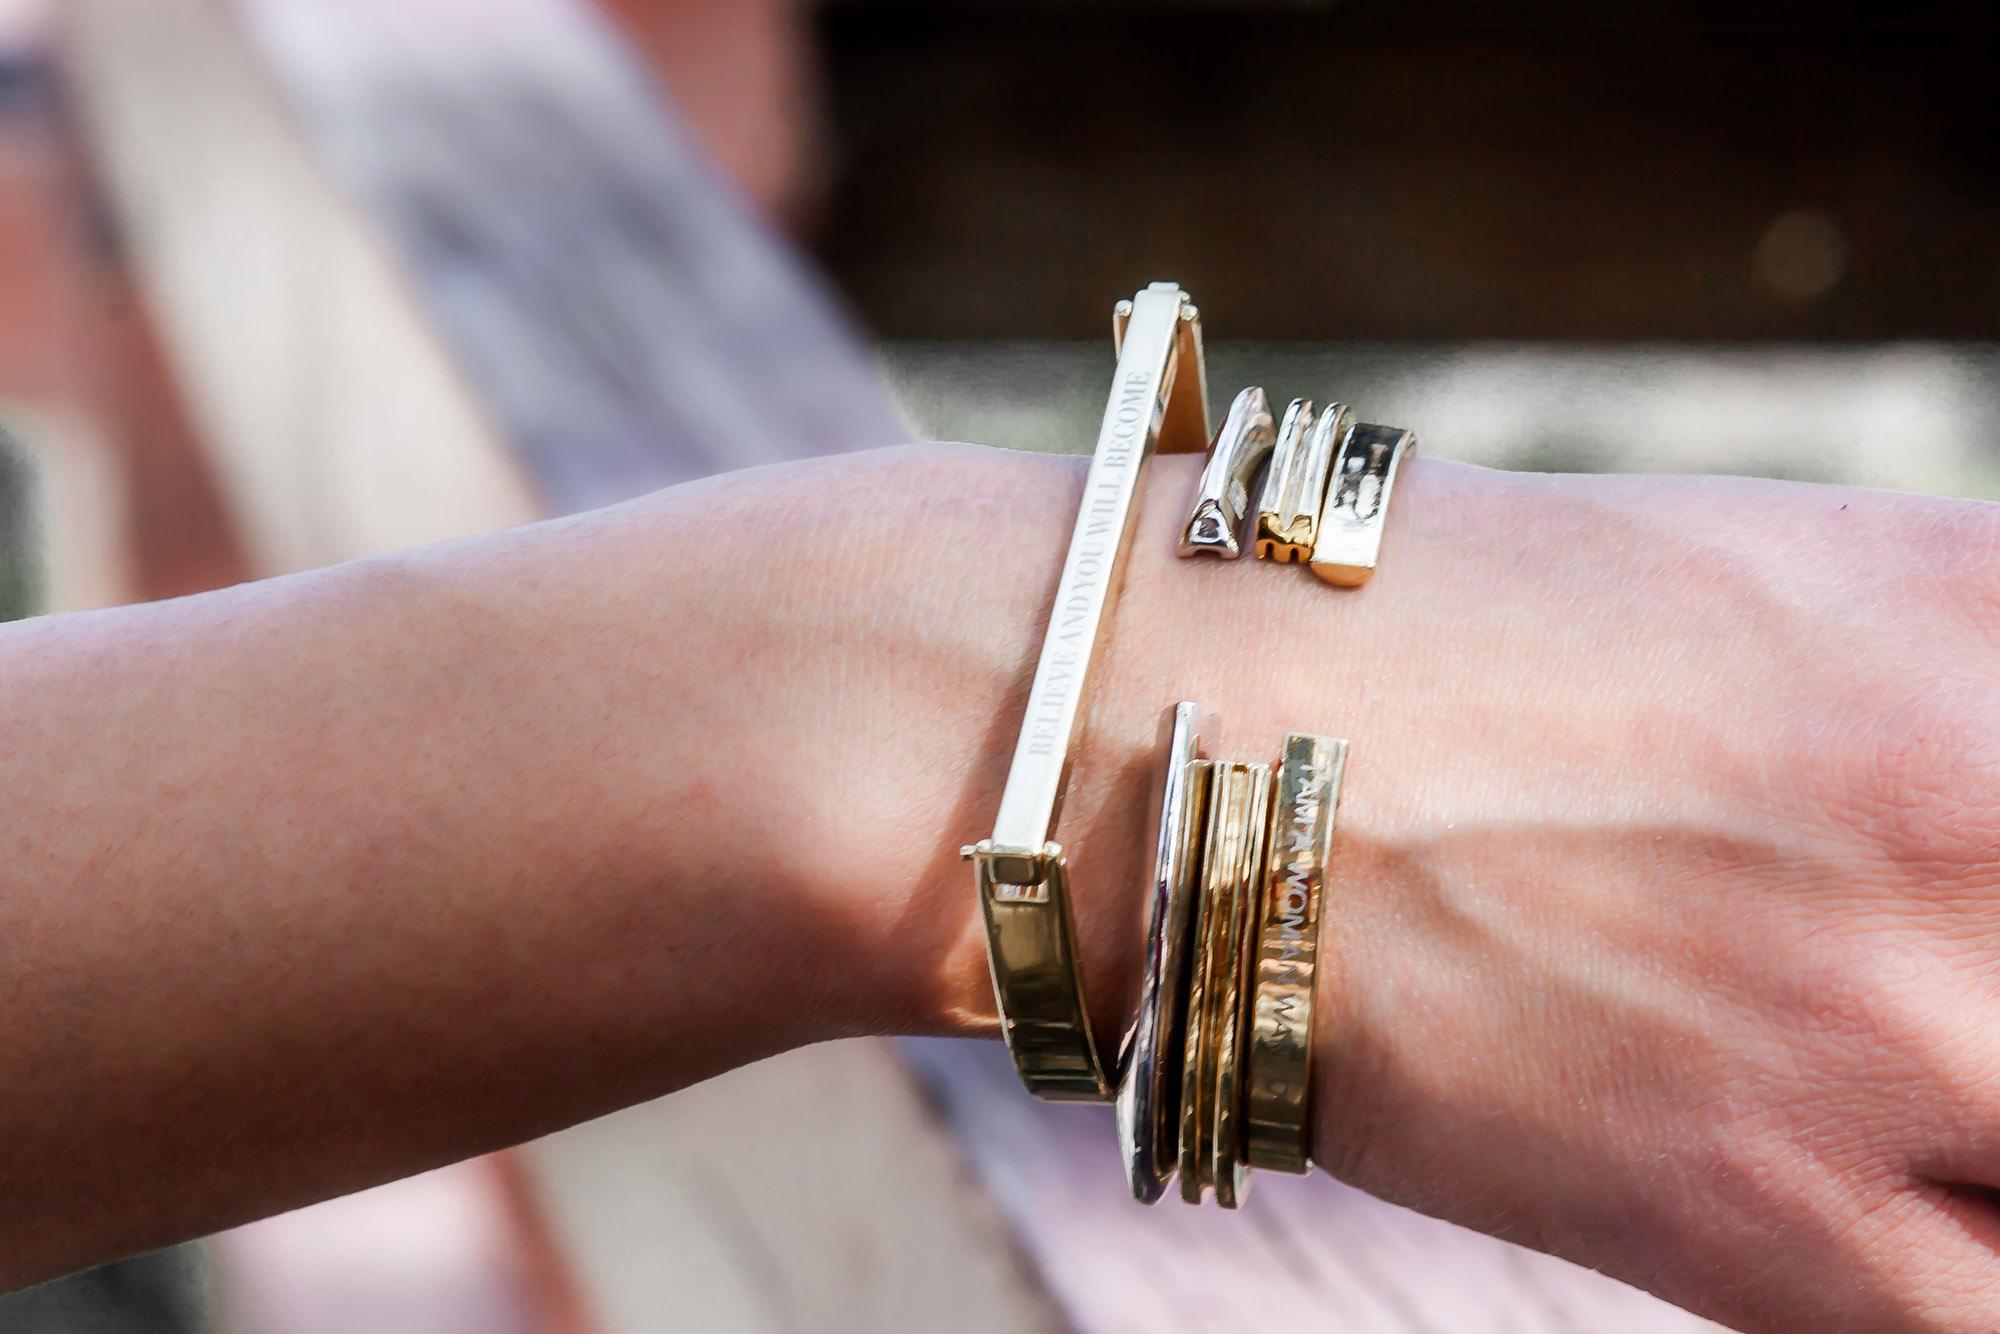 Anchyi Adorned in Stella Valle bracelets